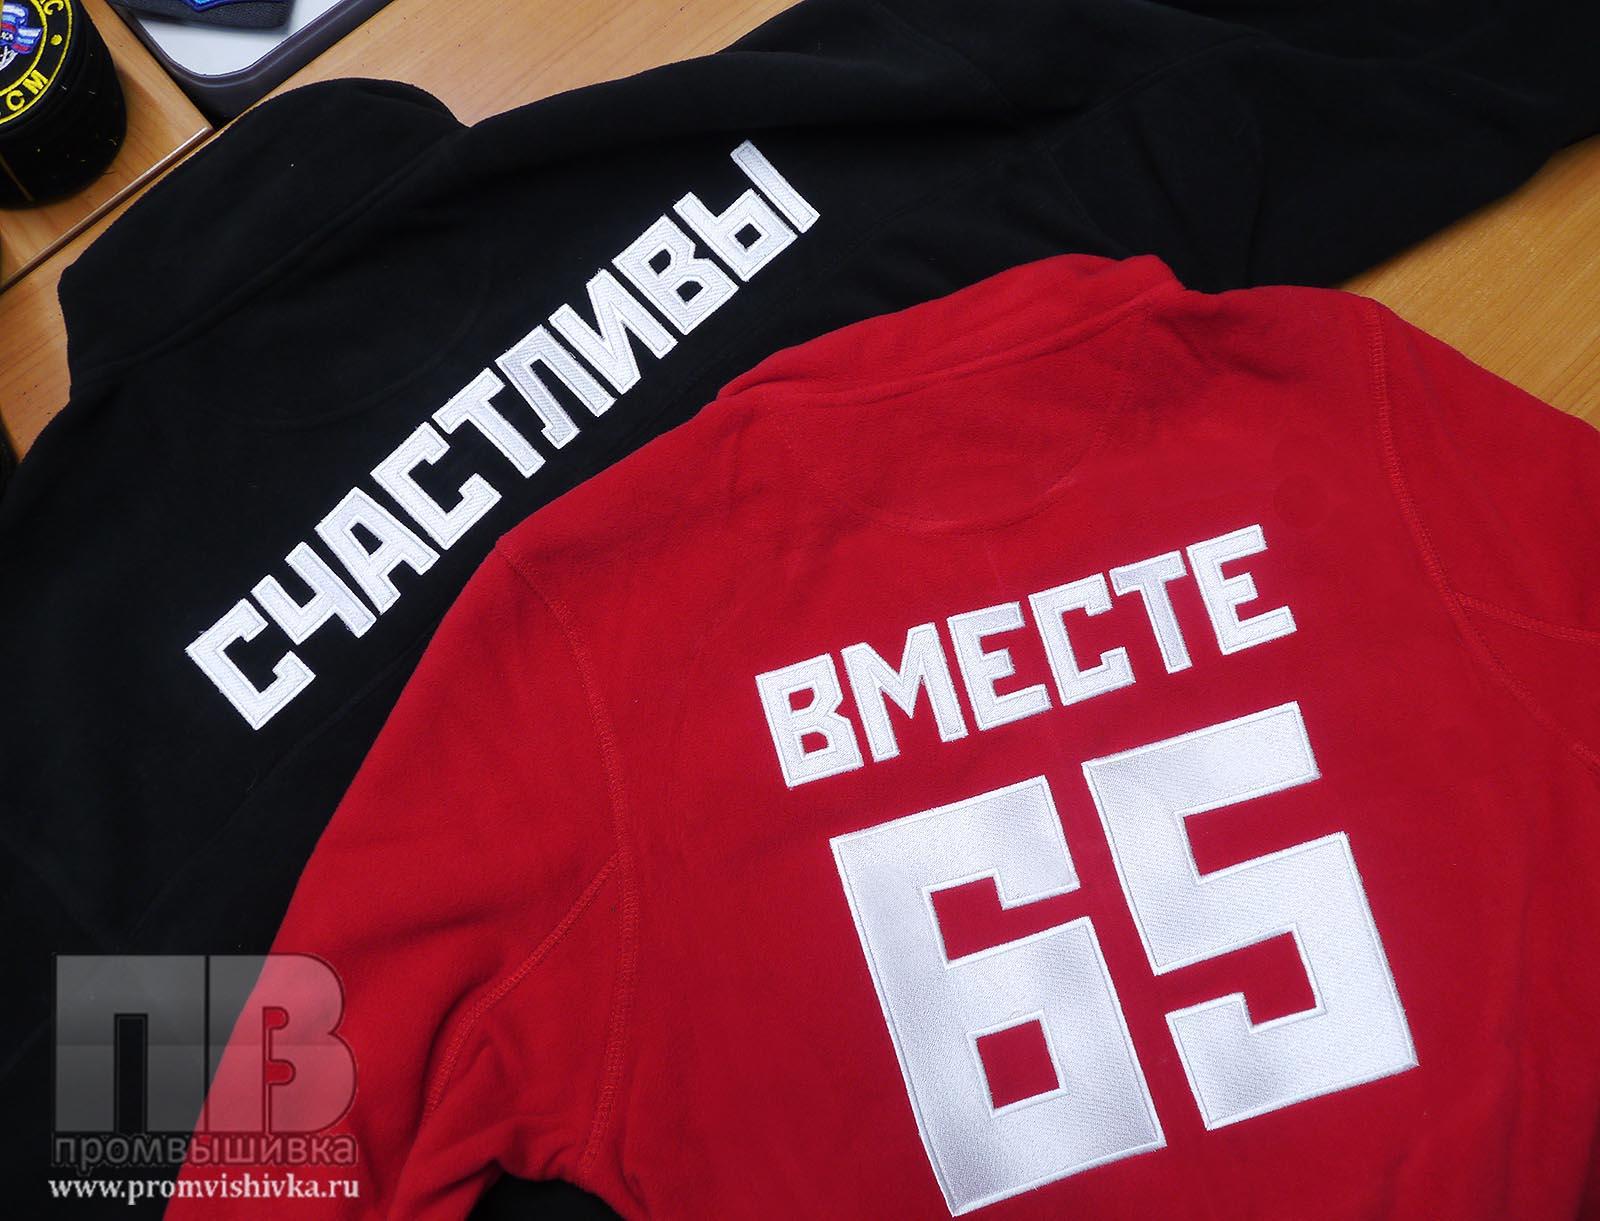 Парные футболки на заказ. Купить парные футболки для двоих влюблённых 29c2c833deb2c